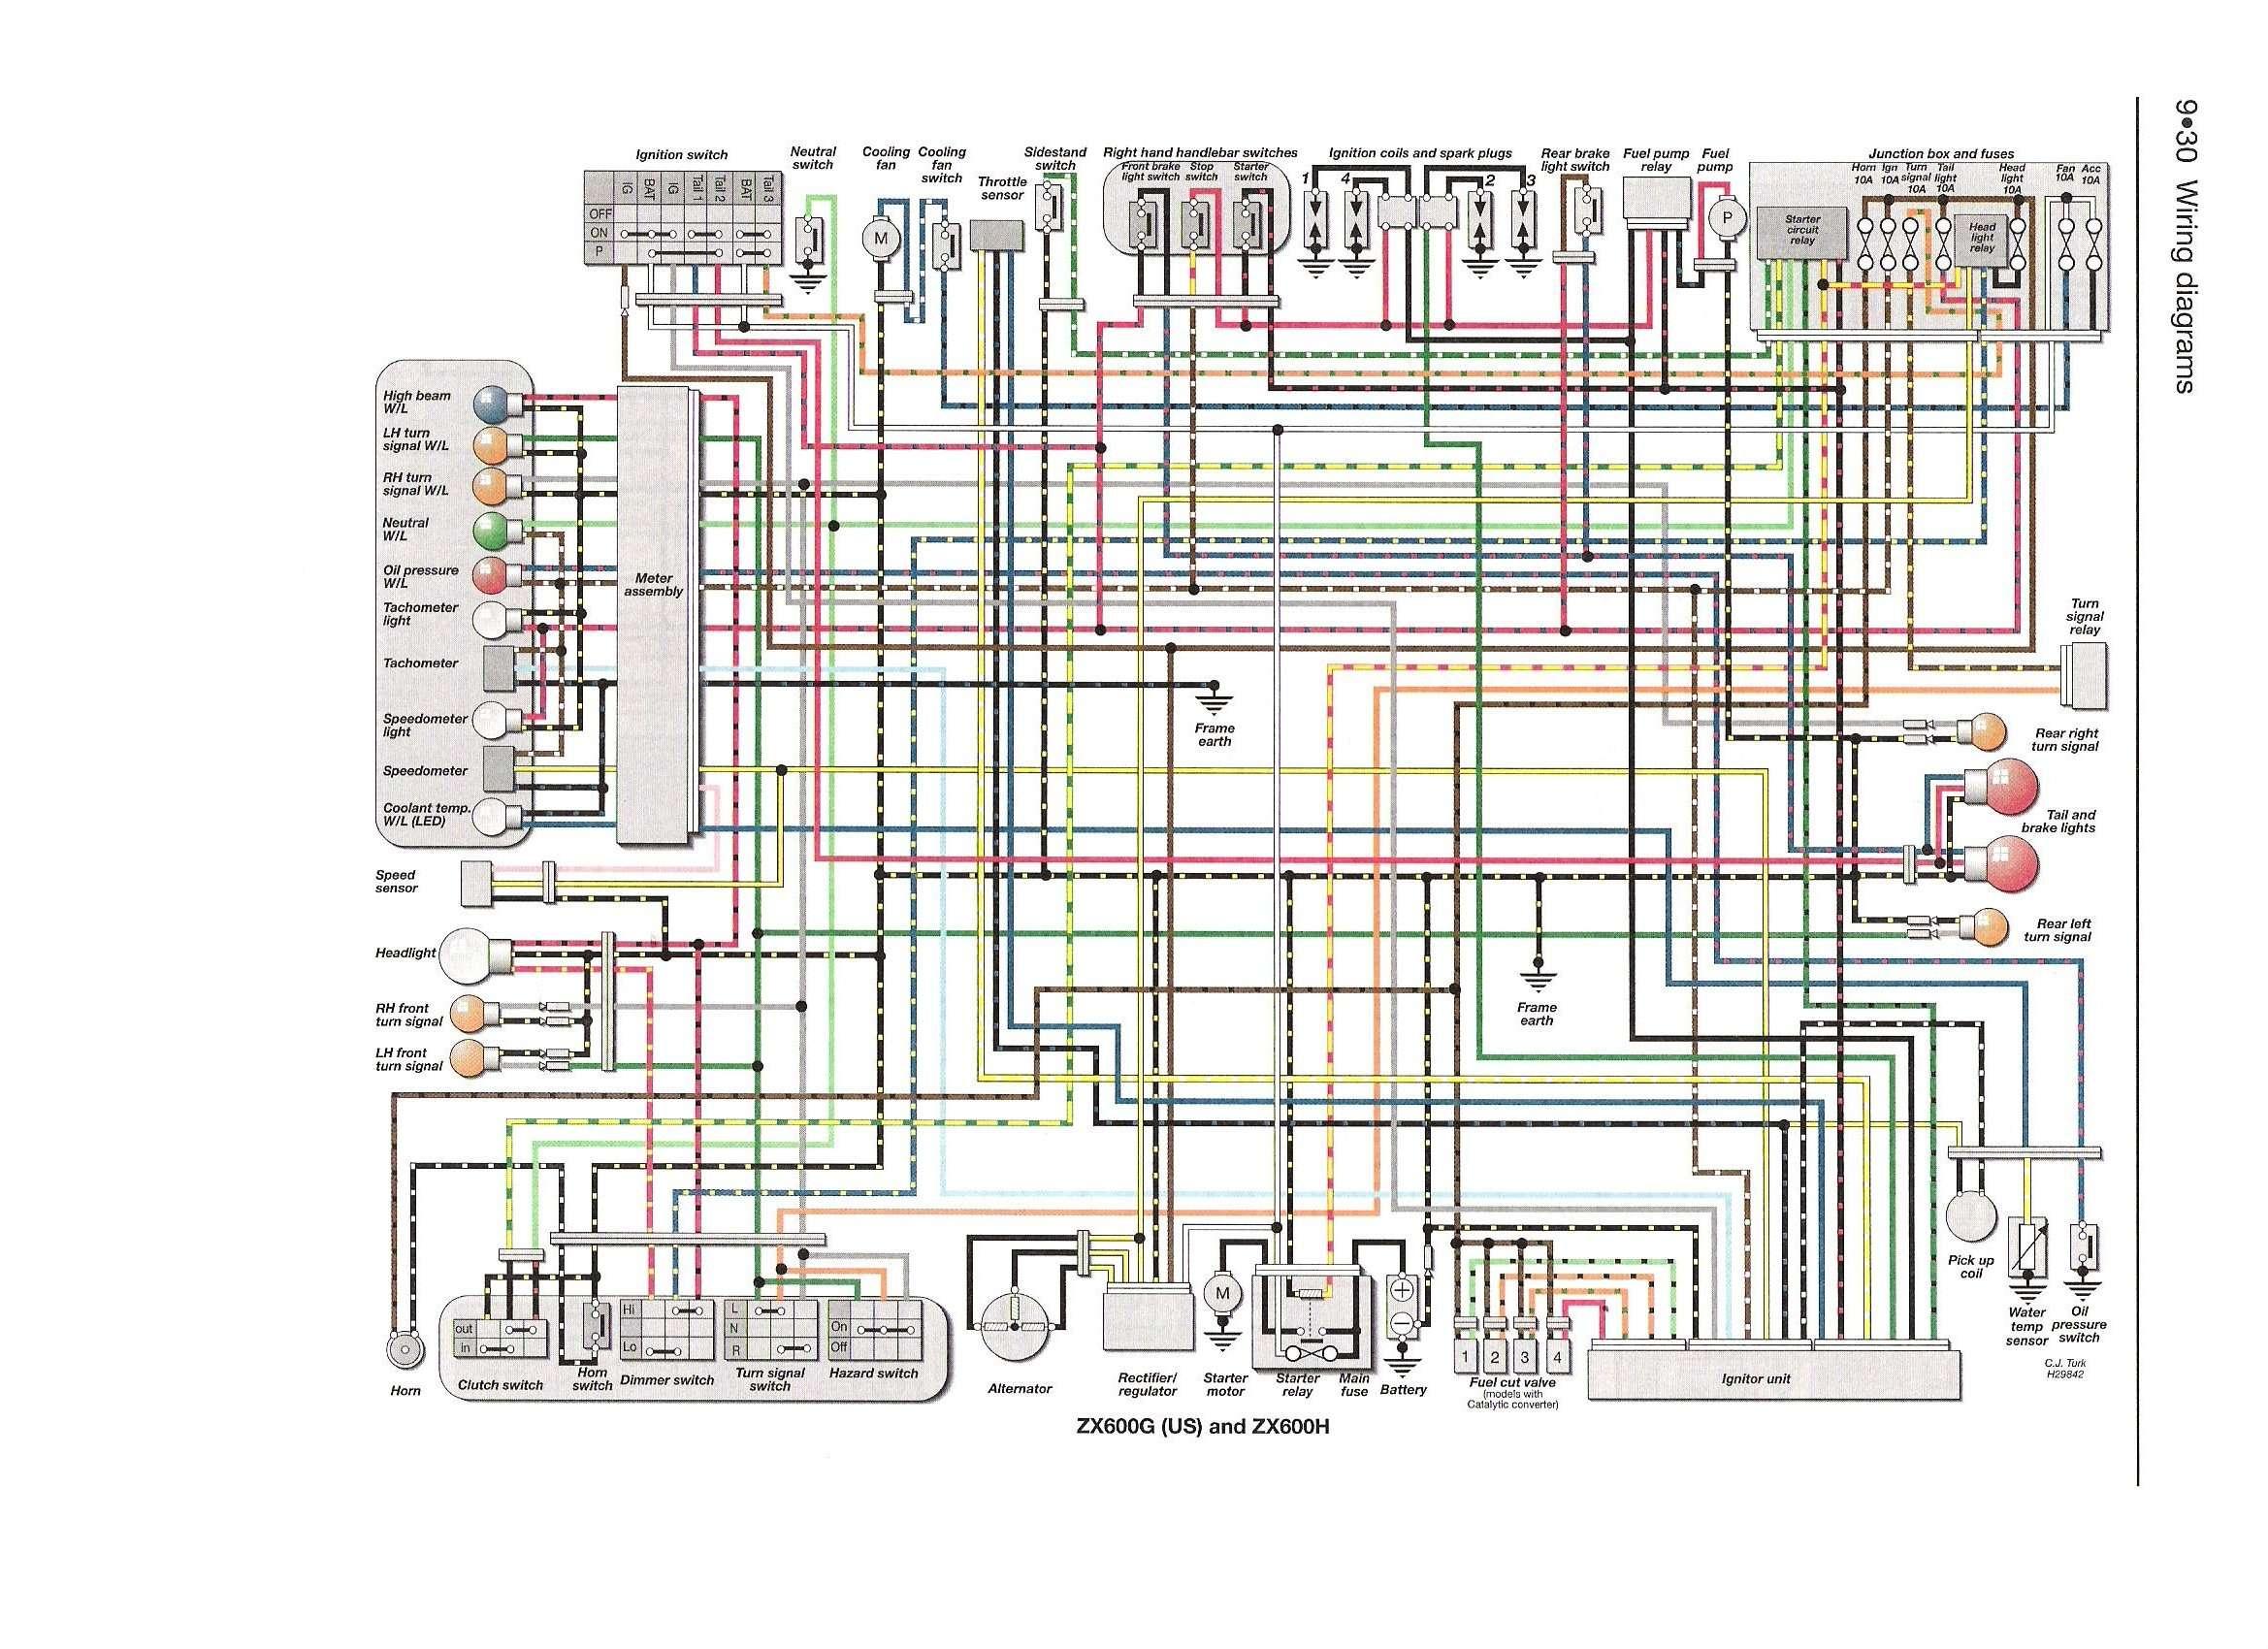 [DIAGRAM_5FD]  Kawasaki Ninja Zx600 Wiring Schematic -Toyota Probox Pimped | Begeboy Wiring  Diagram Source | Kawasaki 2003 636 Wiring Diagram |  | Begeboy Wiring Diagram Source